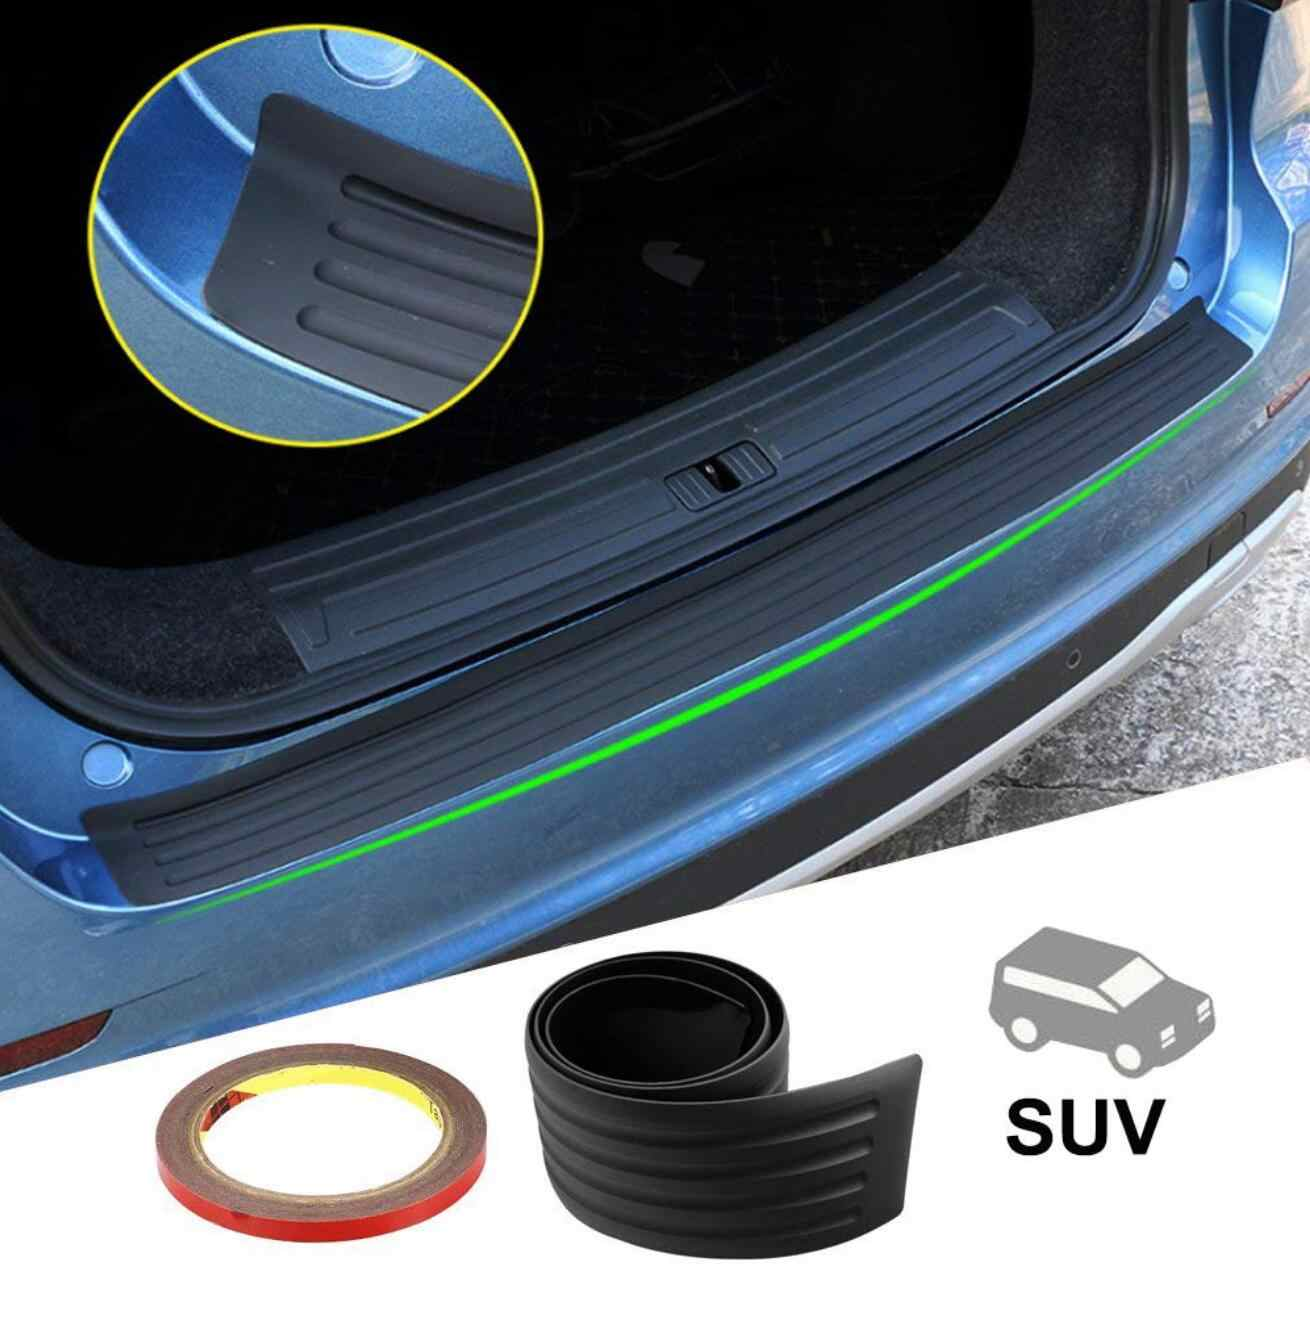 Cubierta protectora de pedales de parachoques trasero para Lexus ES250 RX350 330 ES240 GS460 CT200H CT DS LX LS ES RX GS GXSeries